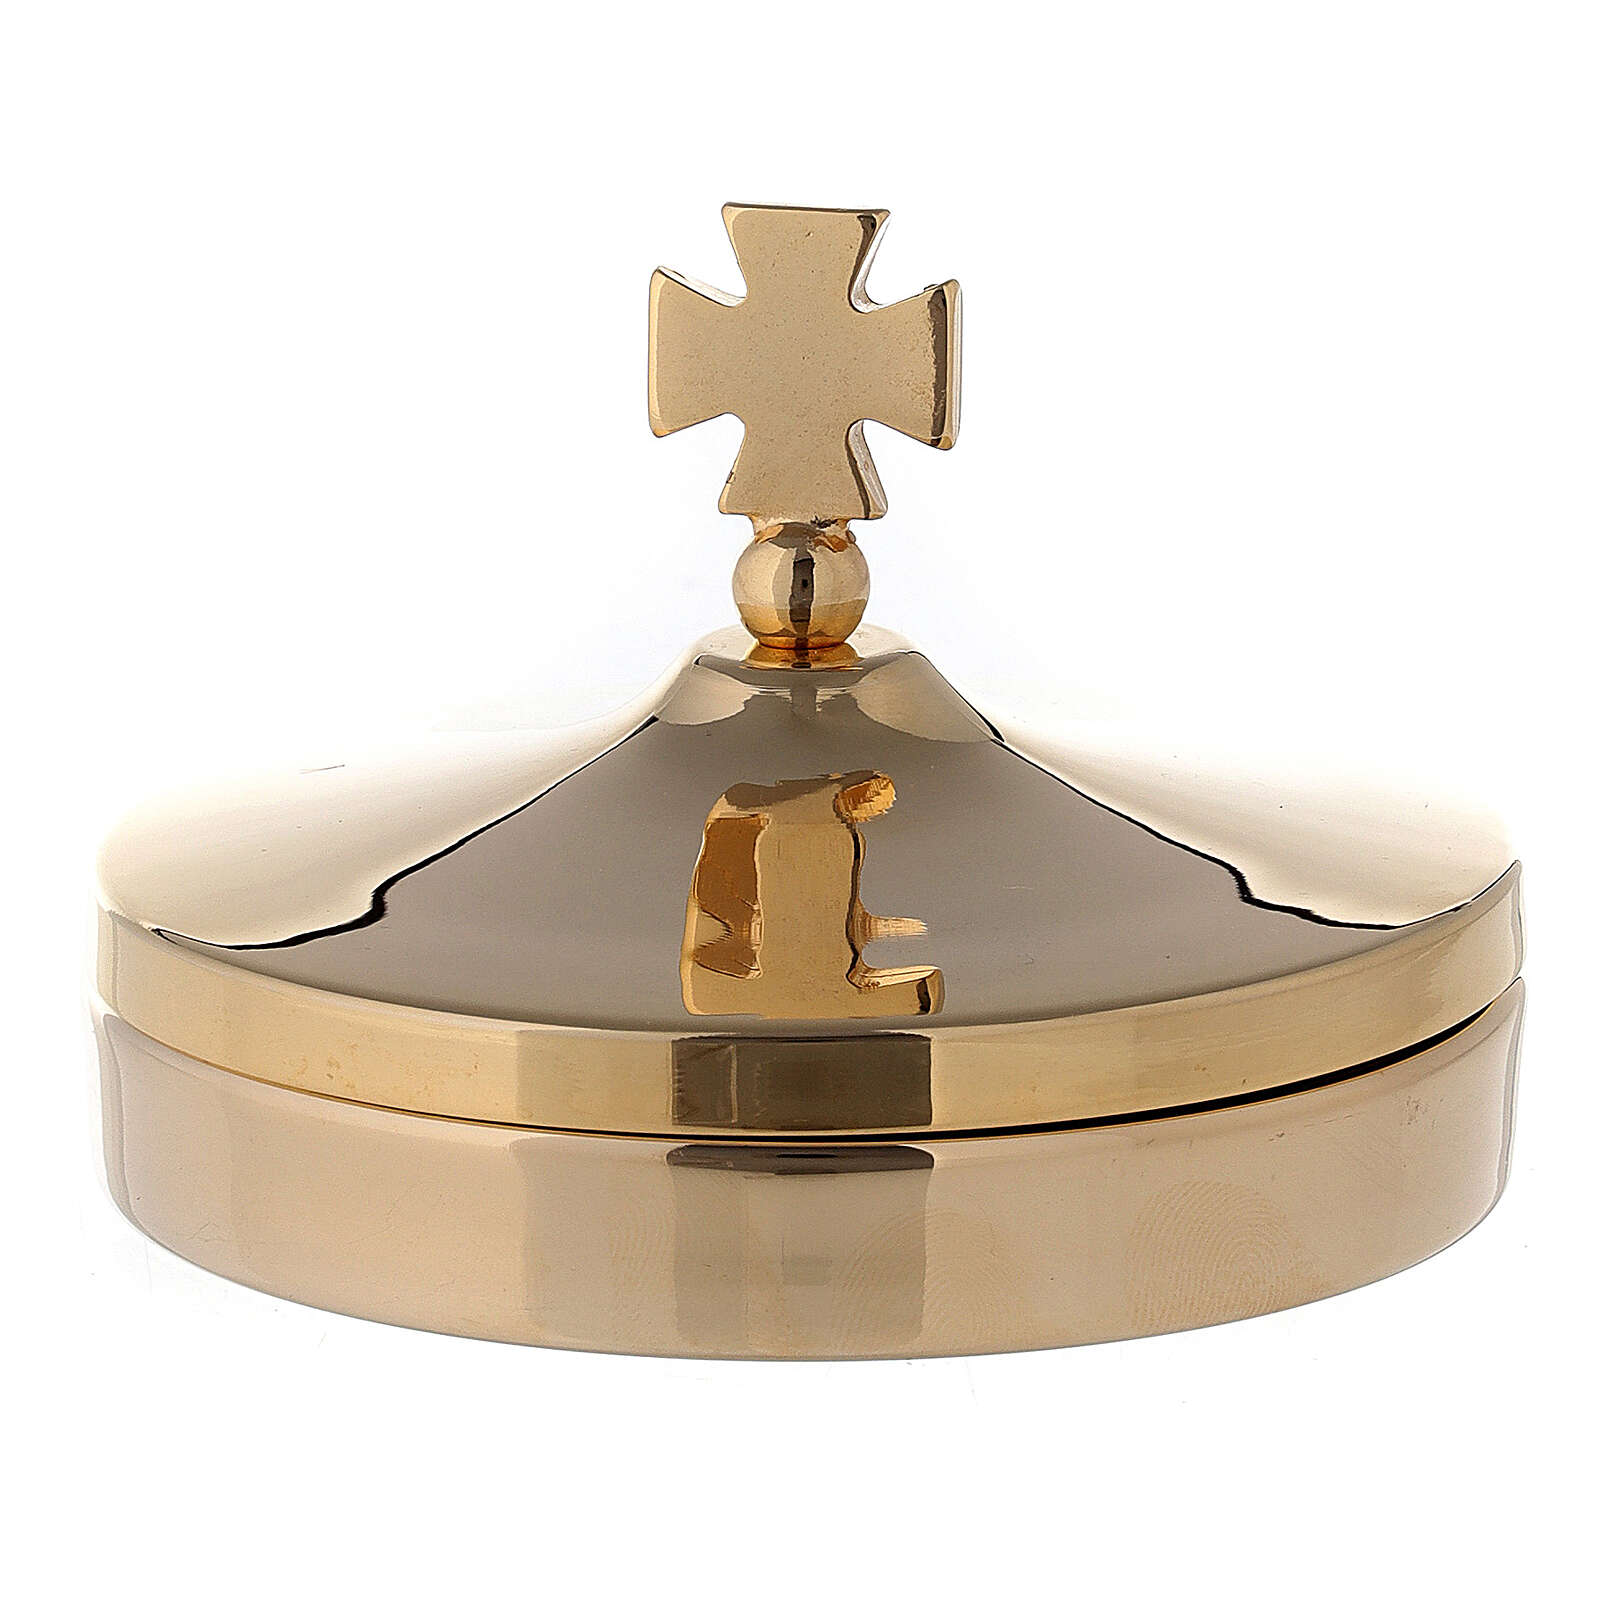 Communion pyx holder diam 8 cm in 24k polished golden brass 3